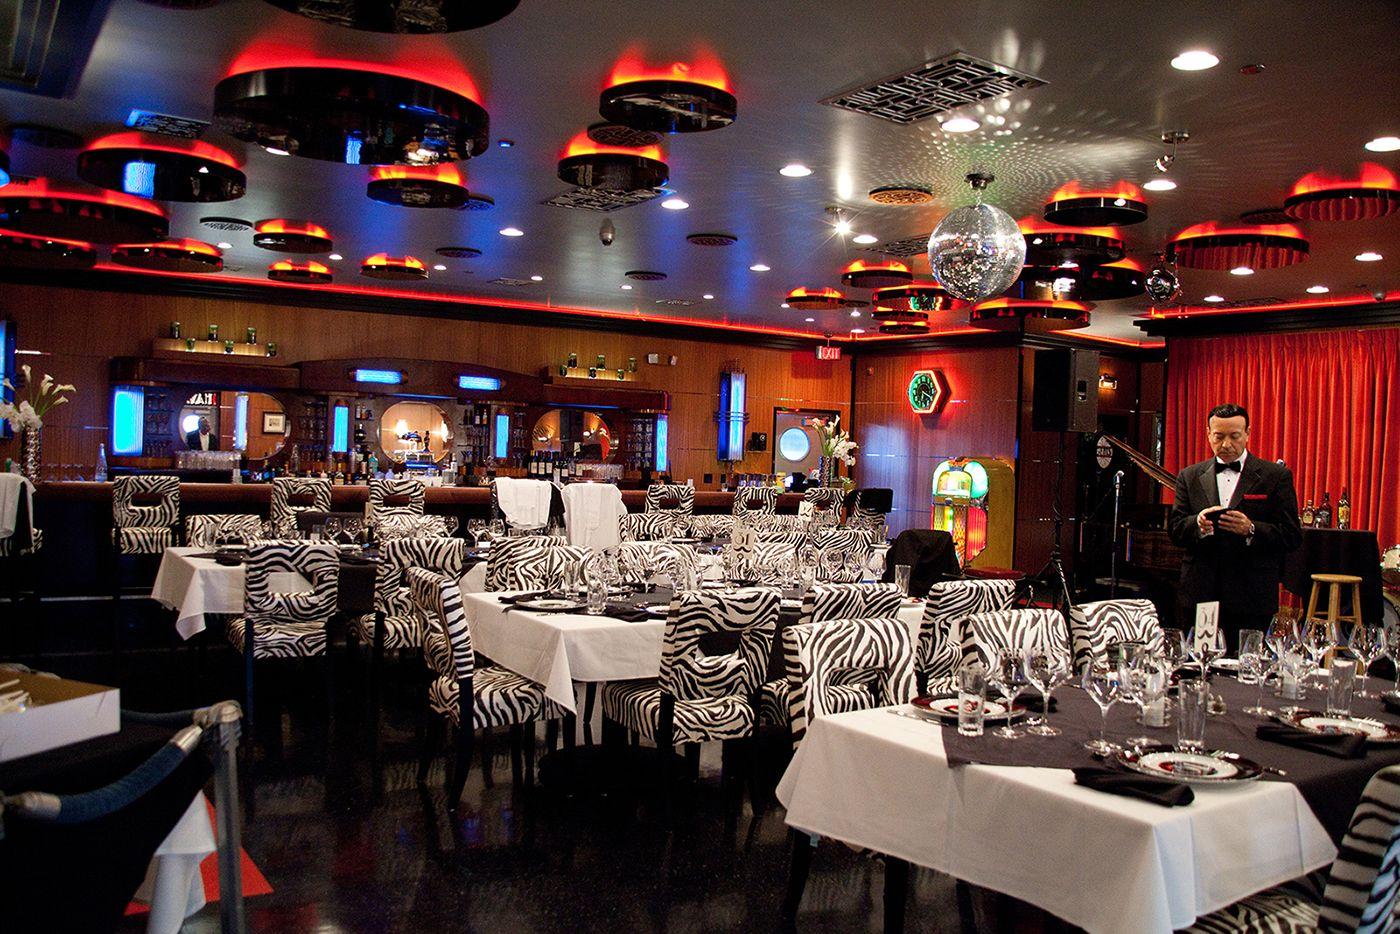 31 Supper Club Ormond Beach Where To Eat In The Daytona Beach Area